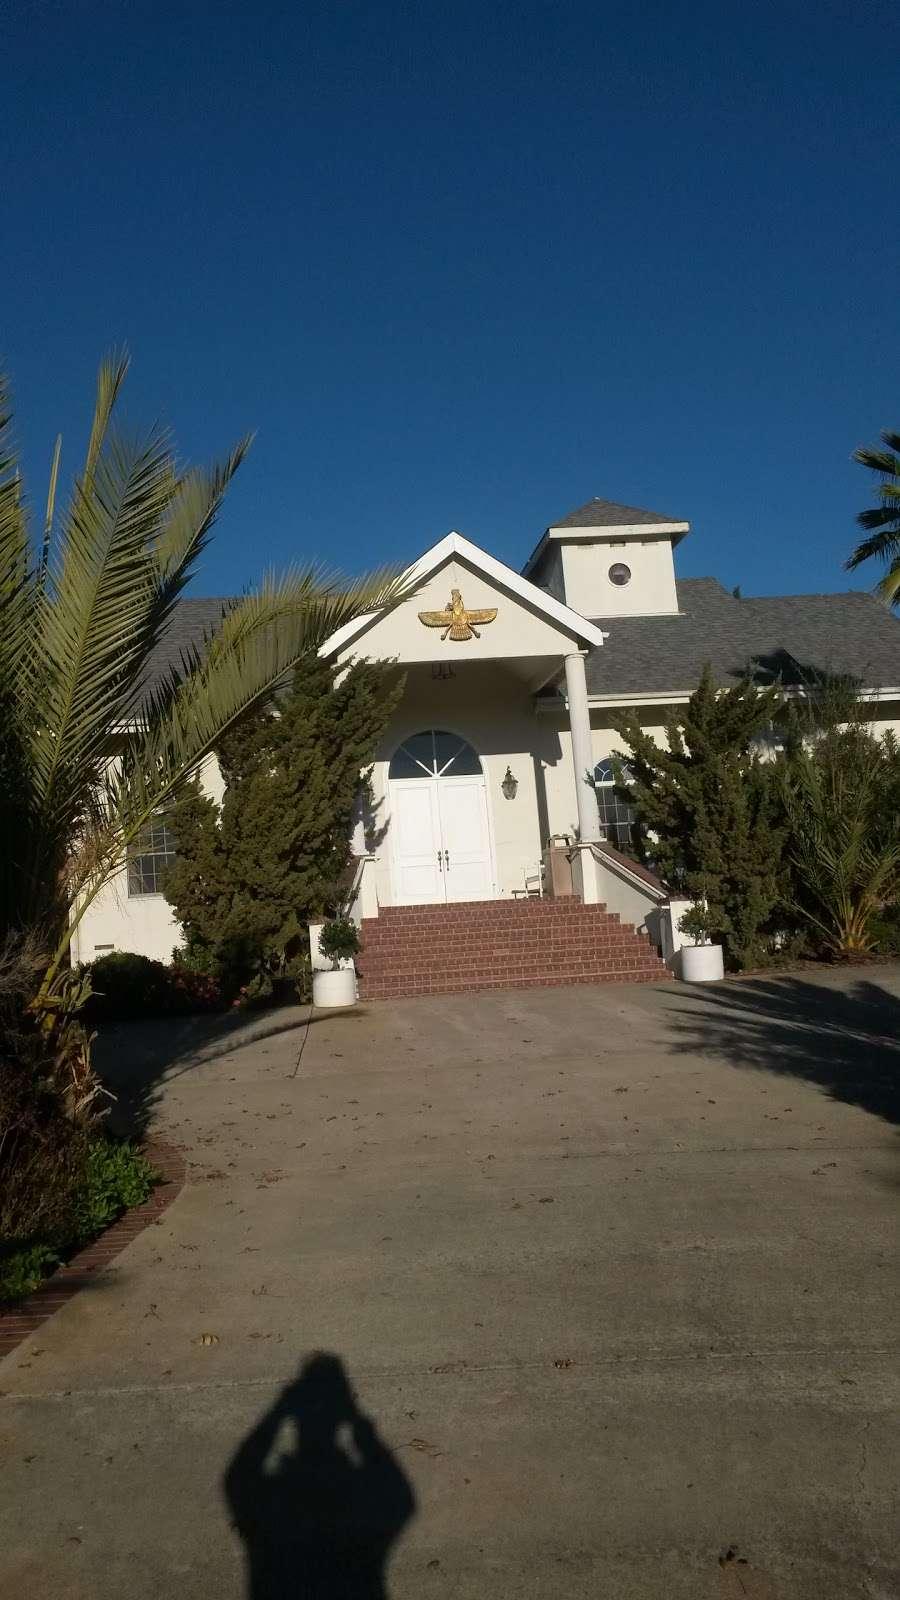 Zoroastrian Temple - church  | Photo 1 of 10 | Address: 10468 Crothers Rd, San Jose, CA 95127, USA | Phone: (408) 272-1678